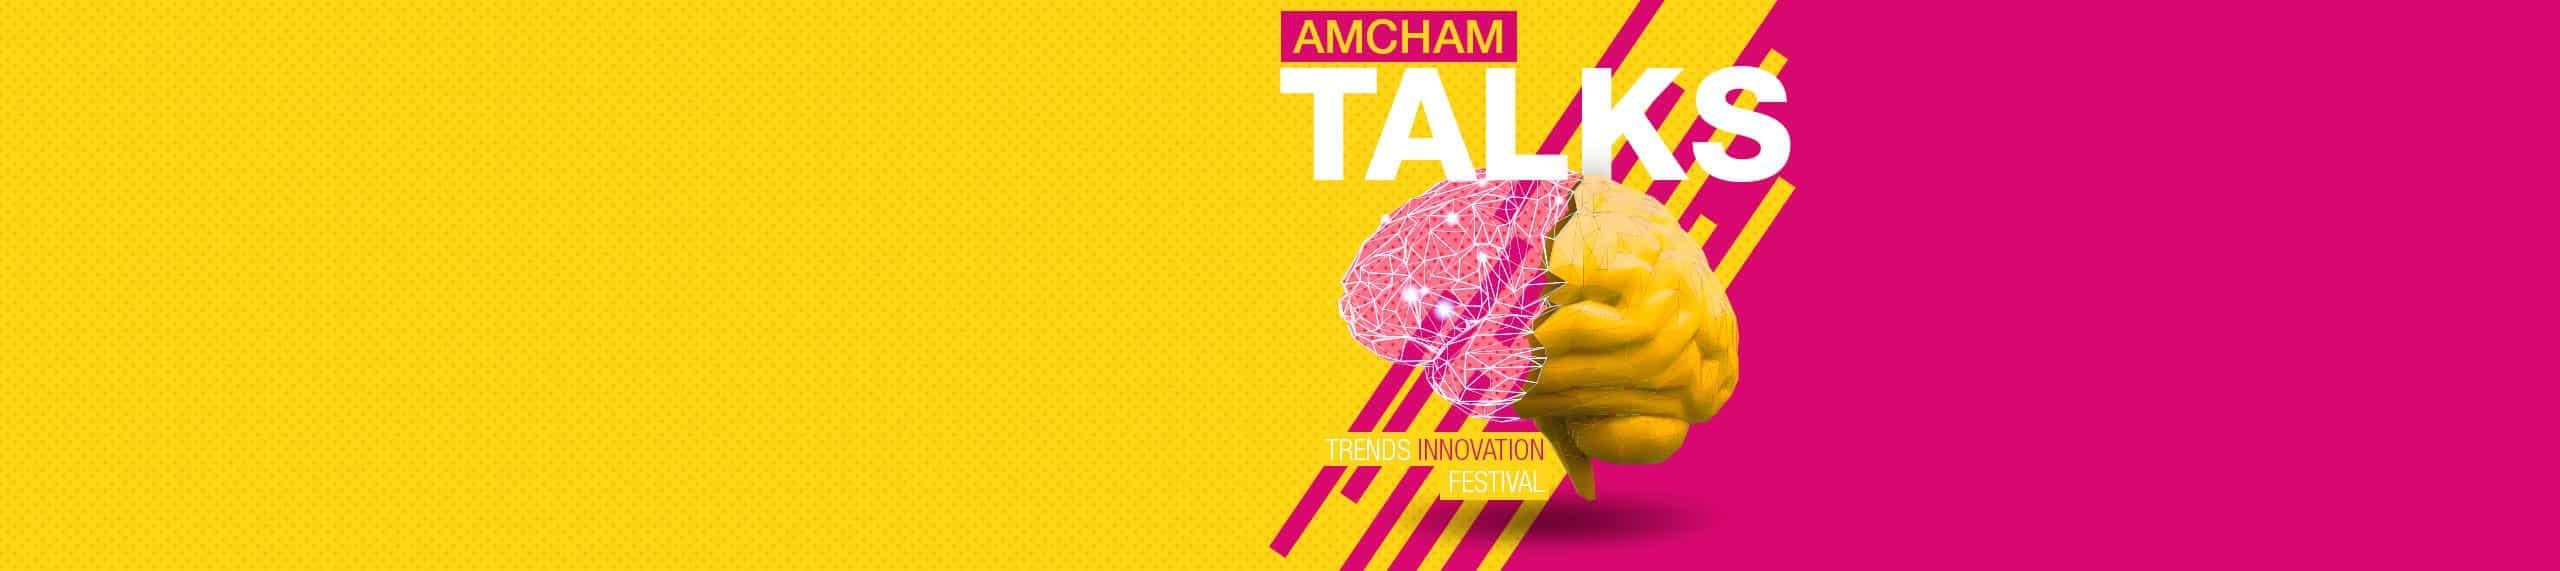 Amcham Talks